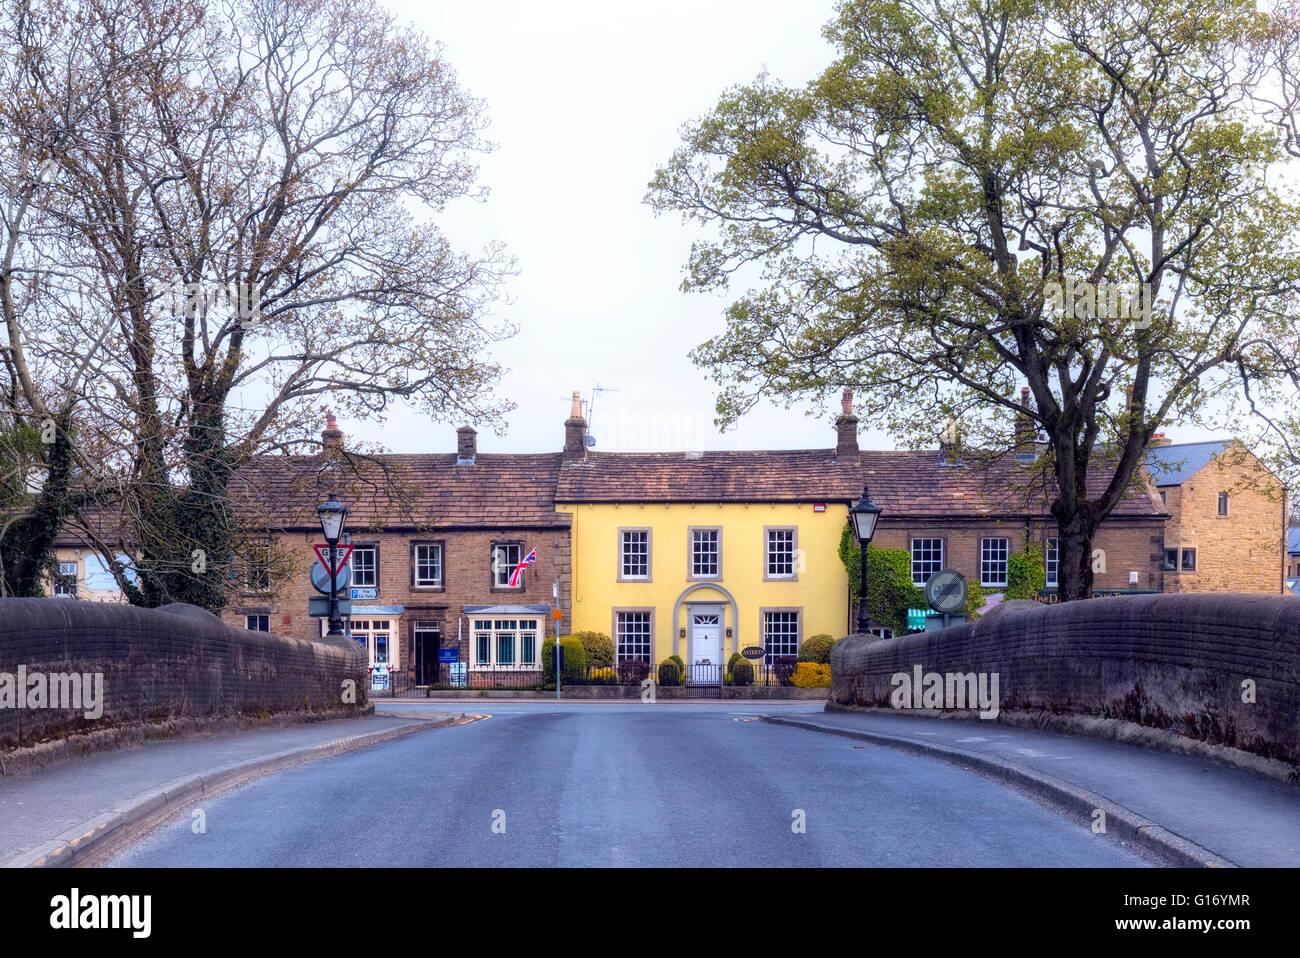 Gargrave, Craven, North Yorkshire, England, UK - Stock Image